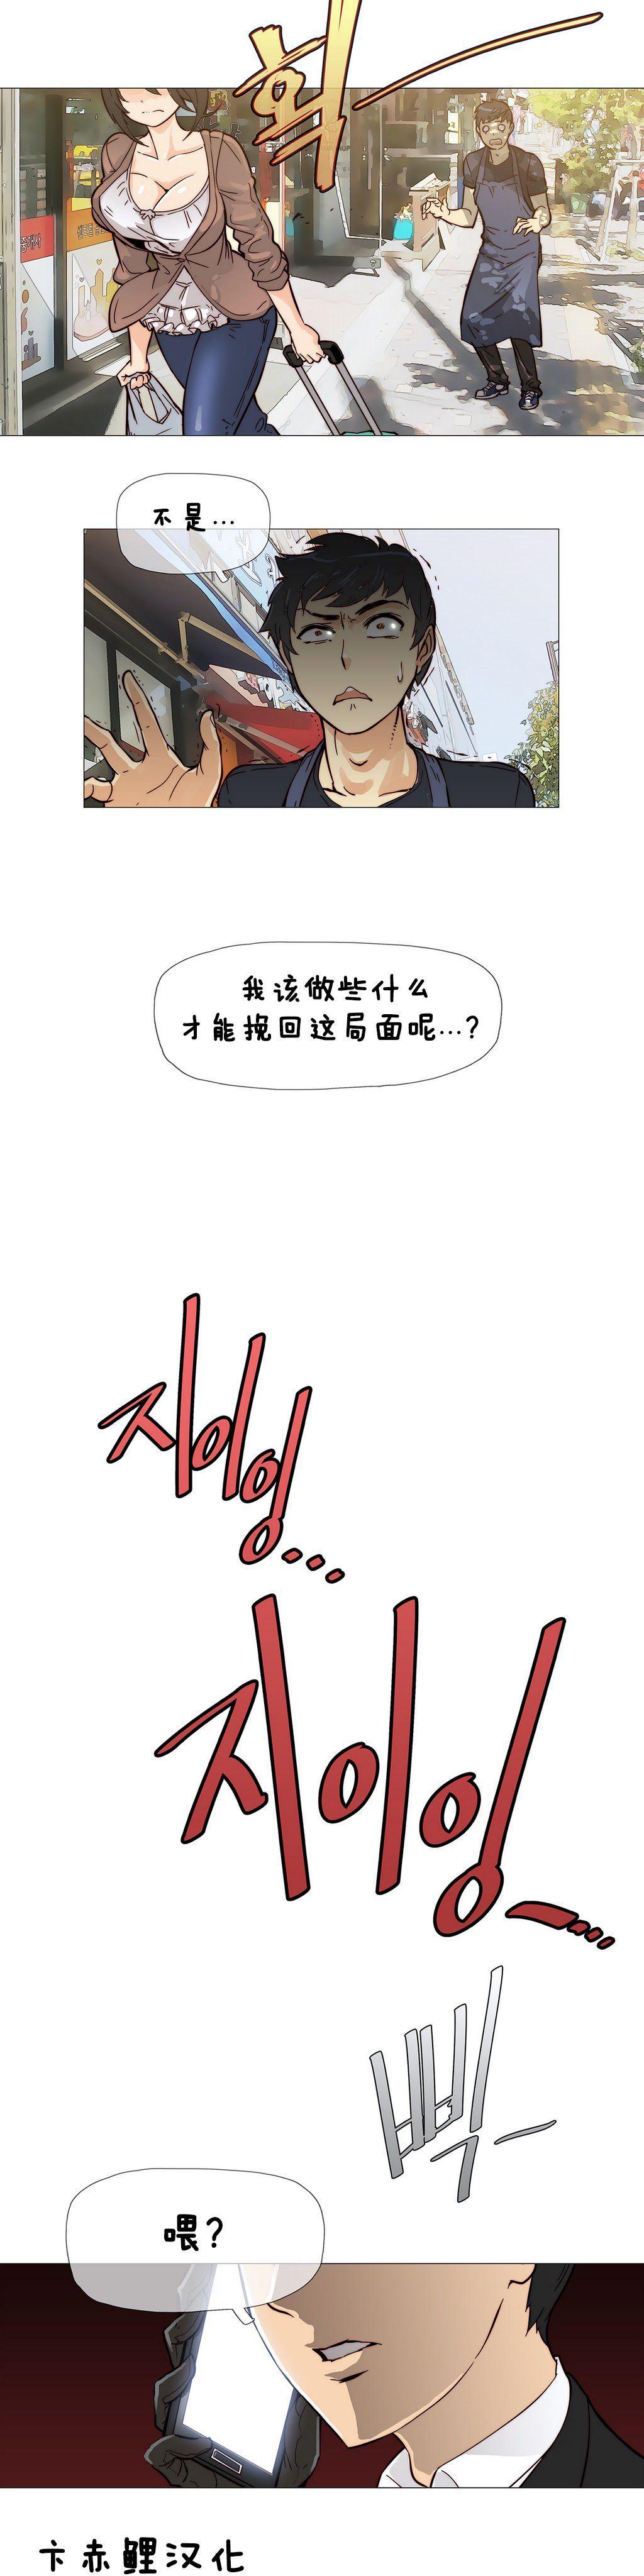 HouseHold Affairs 【卞赤鲤汉化】1~15话 80